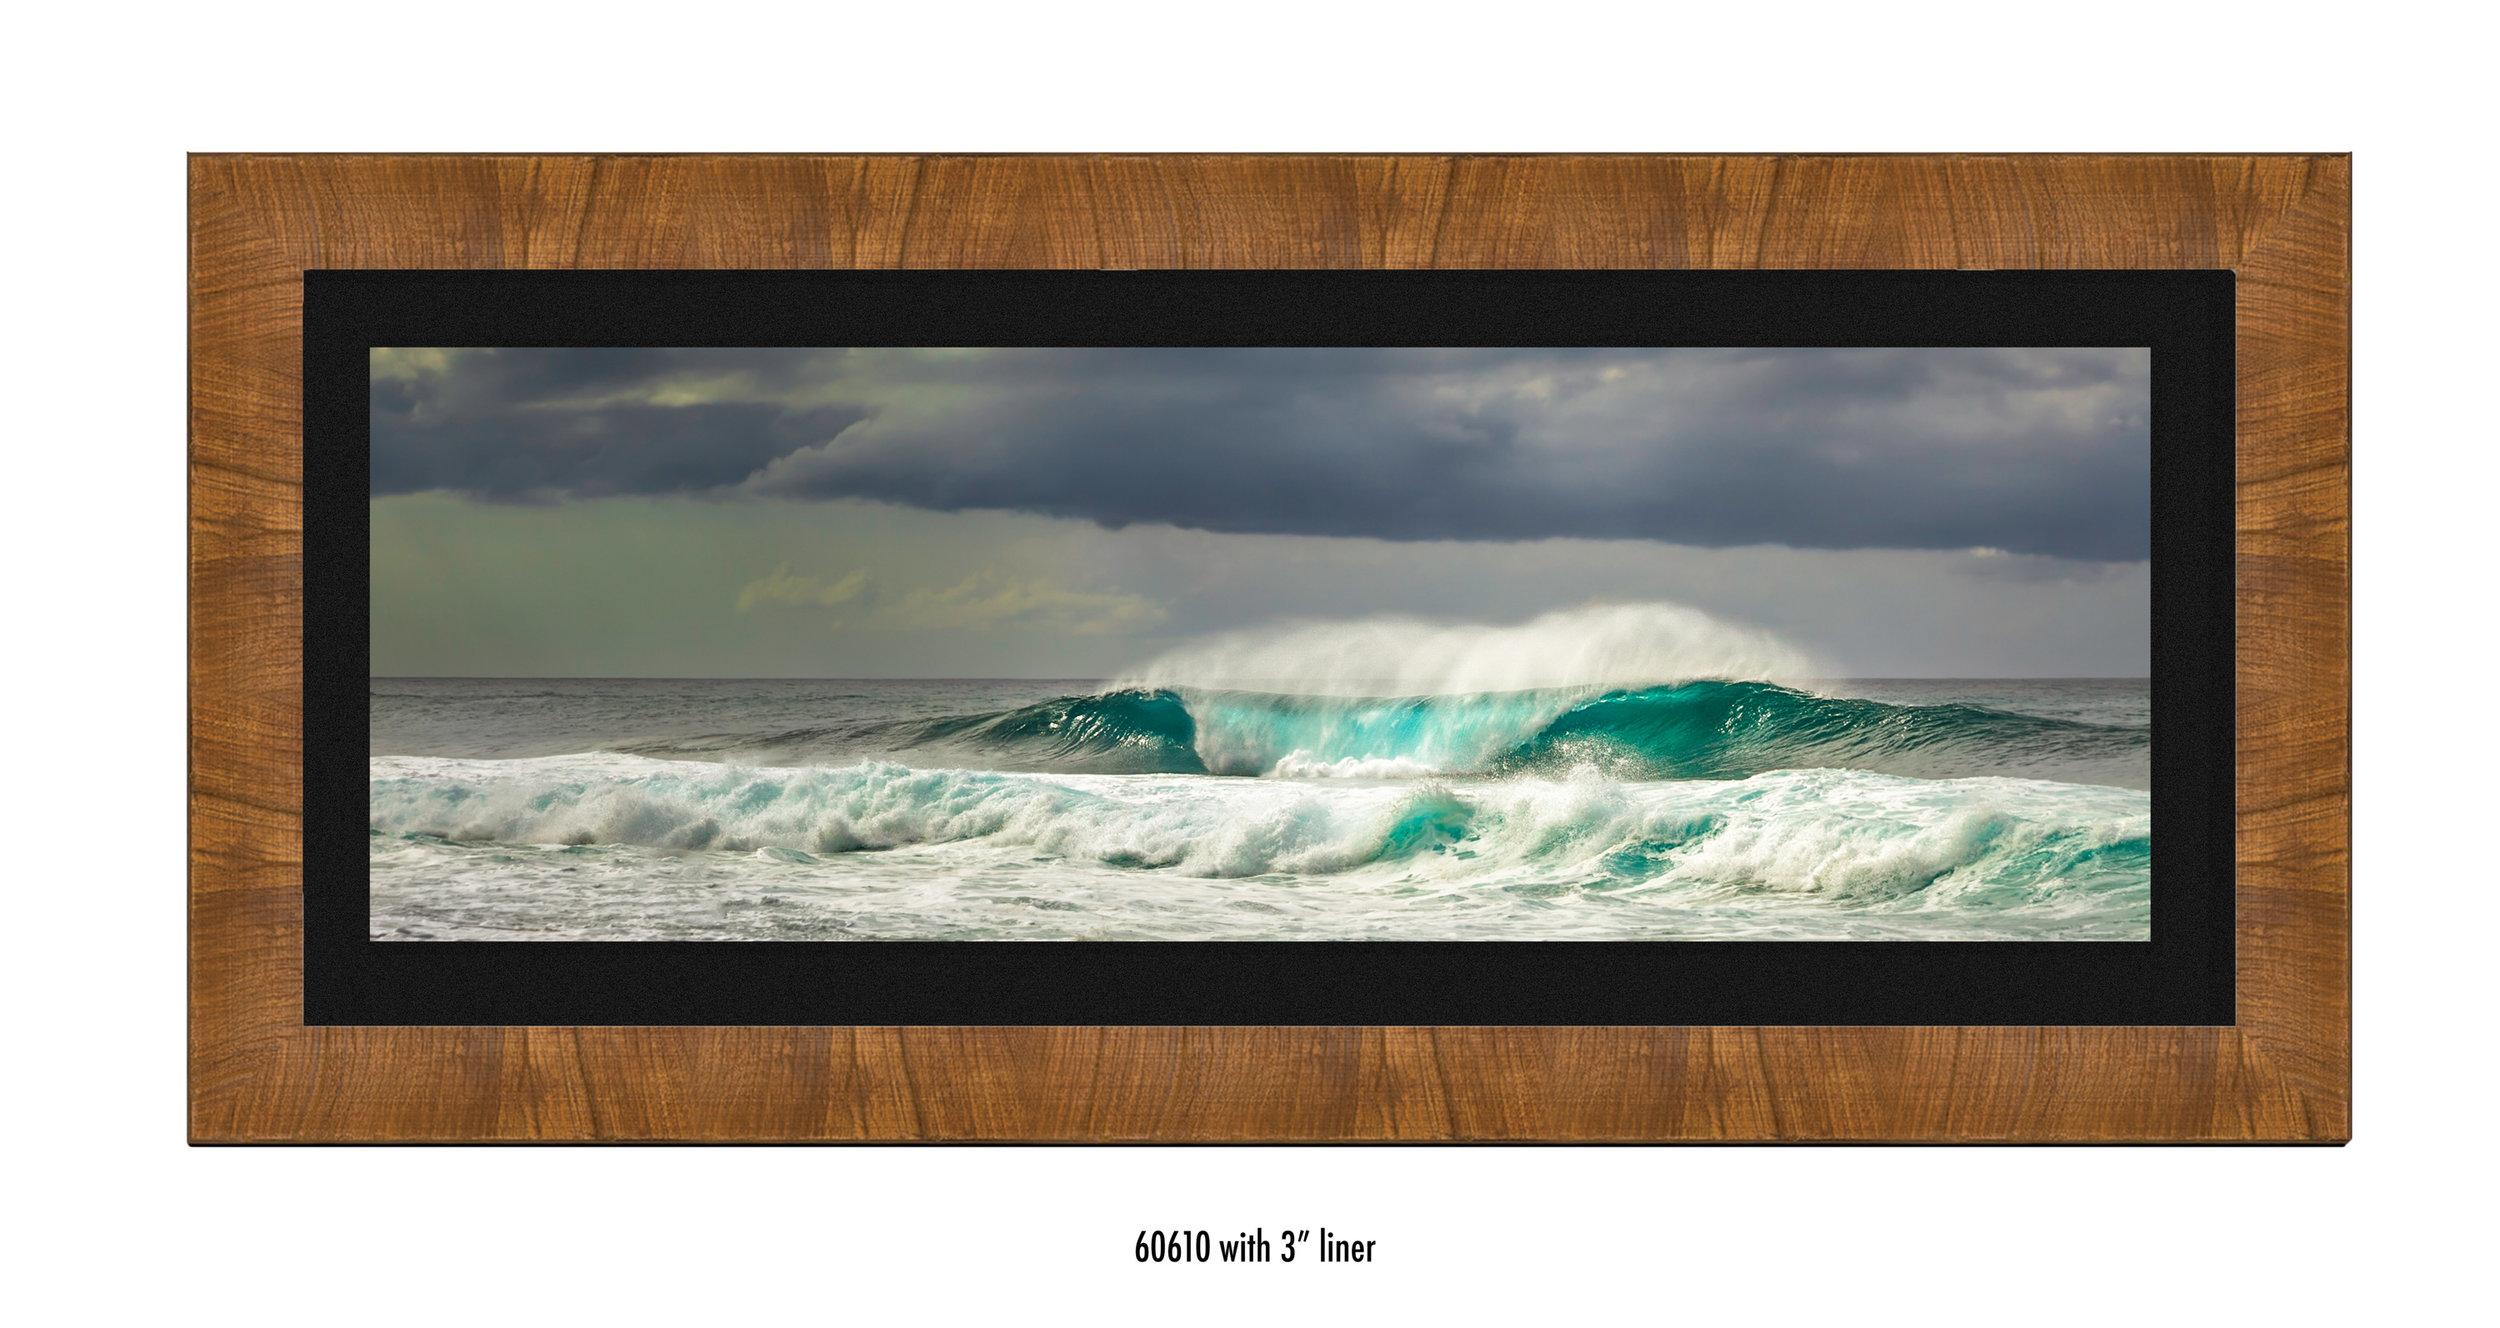 First-Reef-60610-blk.jpg